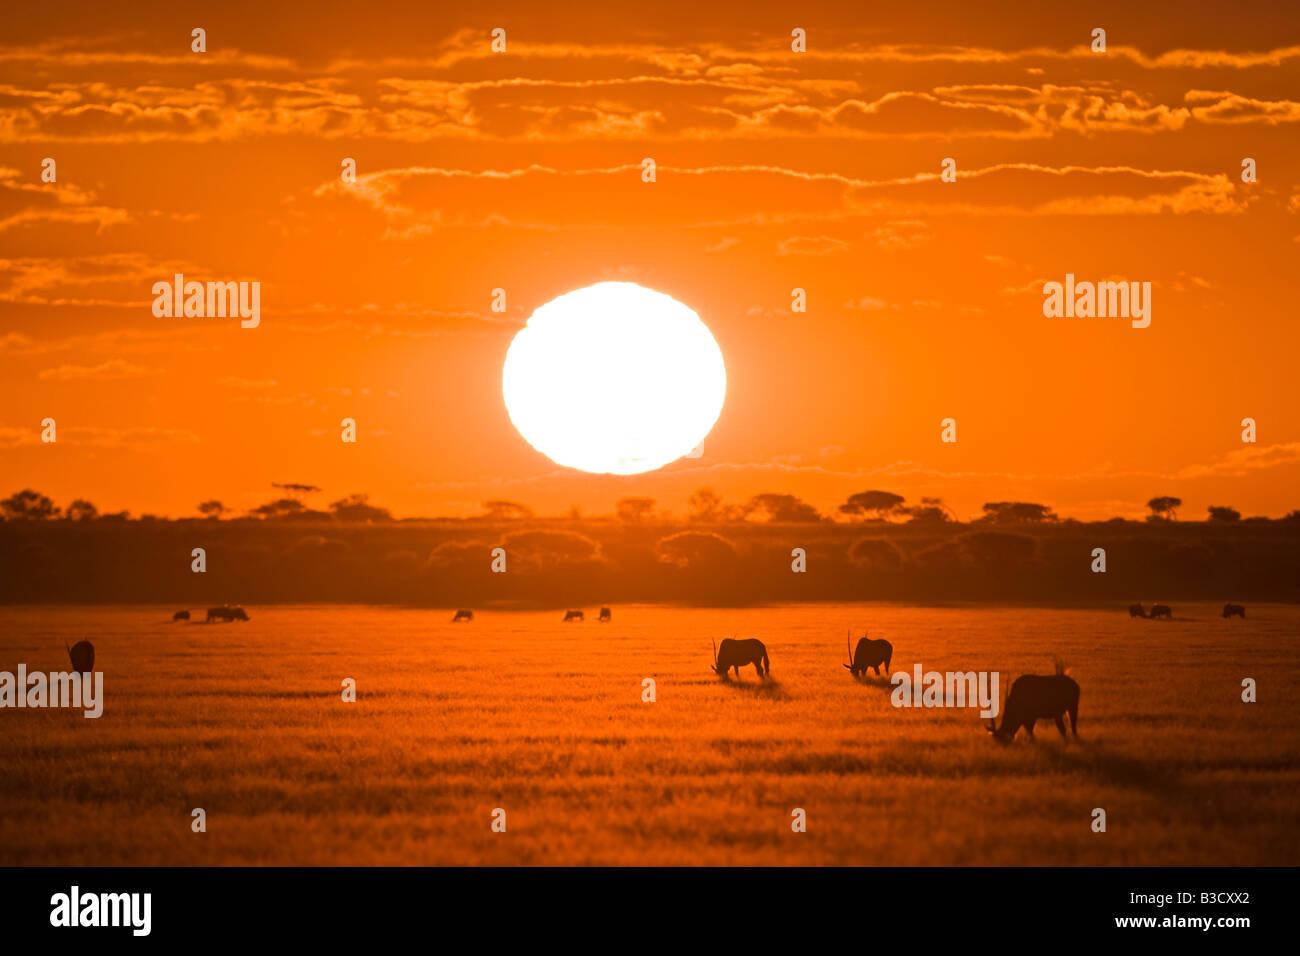 Afrika, Botswana, Silhouette Gemsbock Herde (Oryx Gazella) bei Sonnenuntergang Stockbild